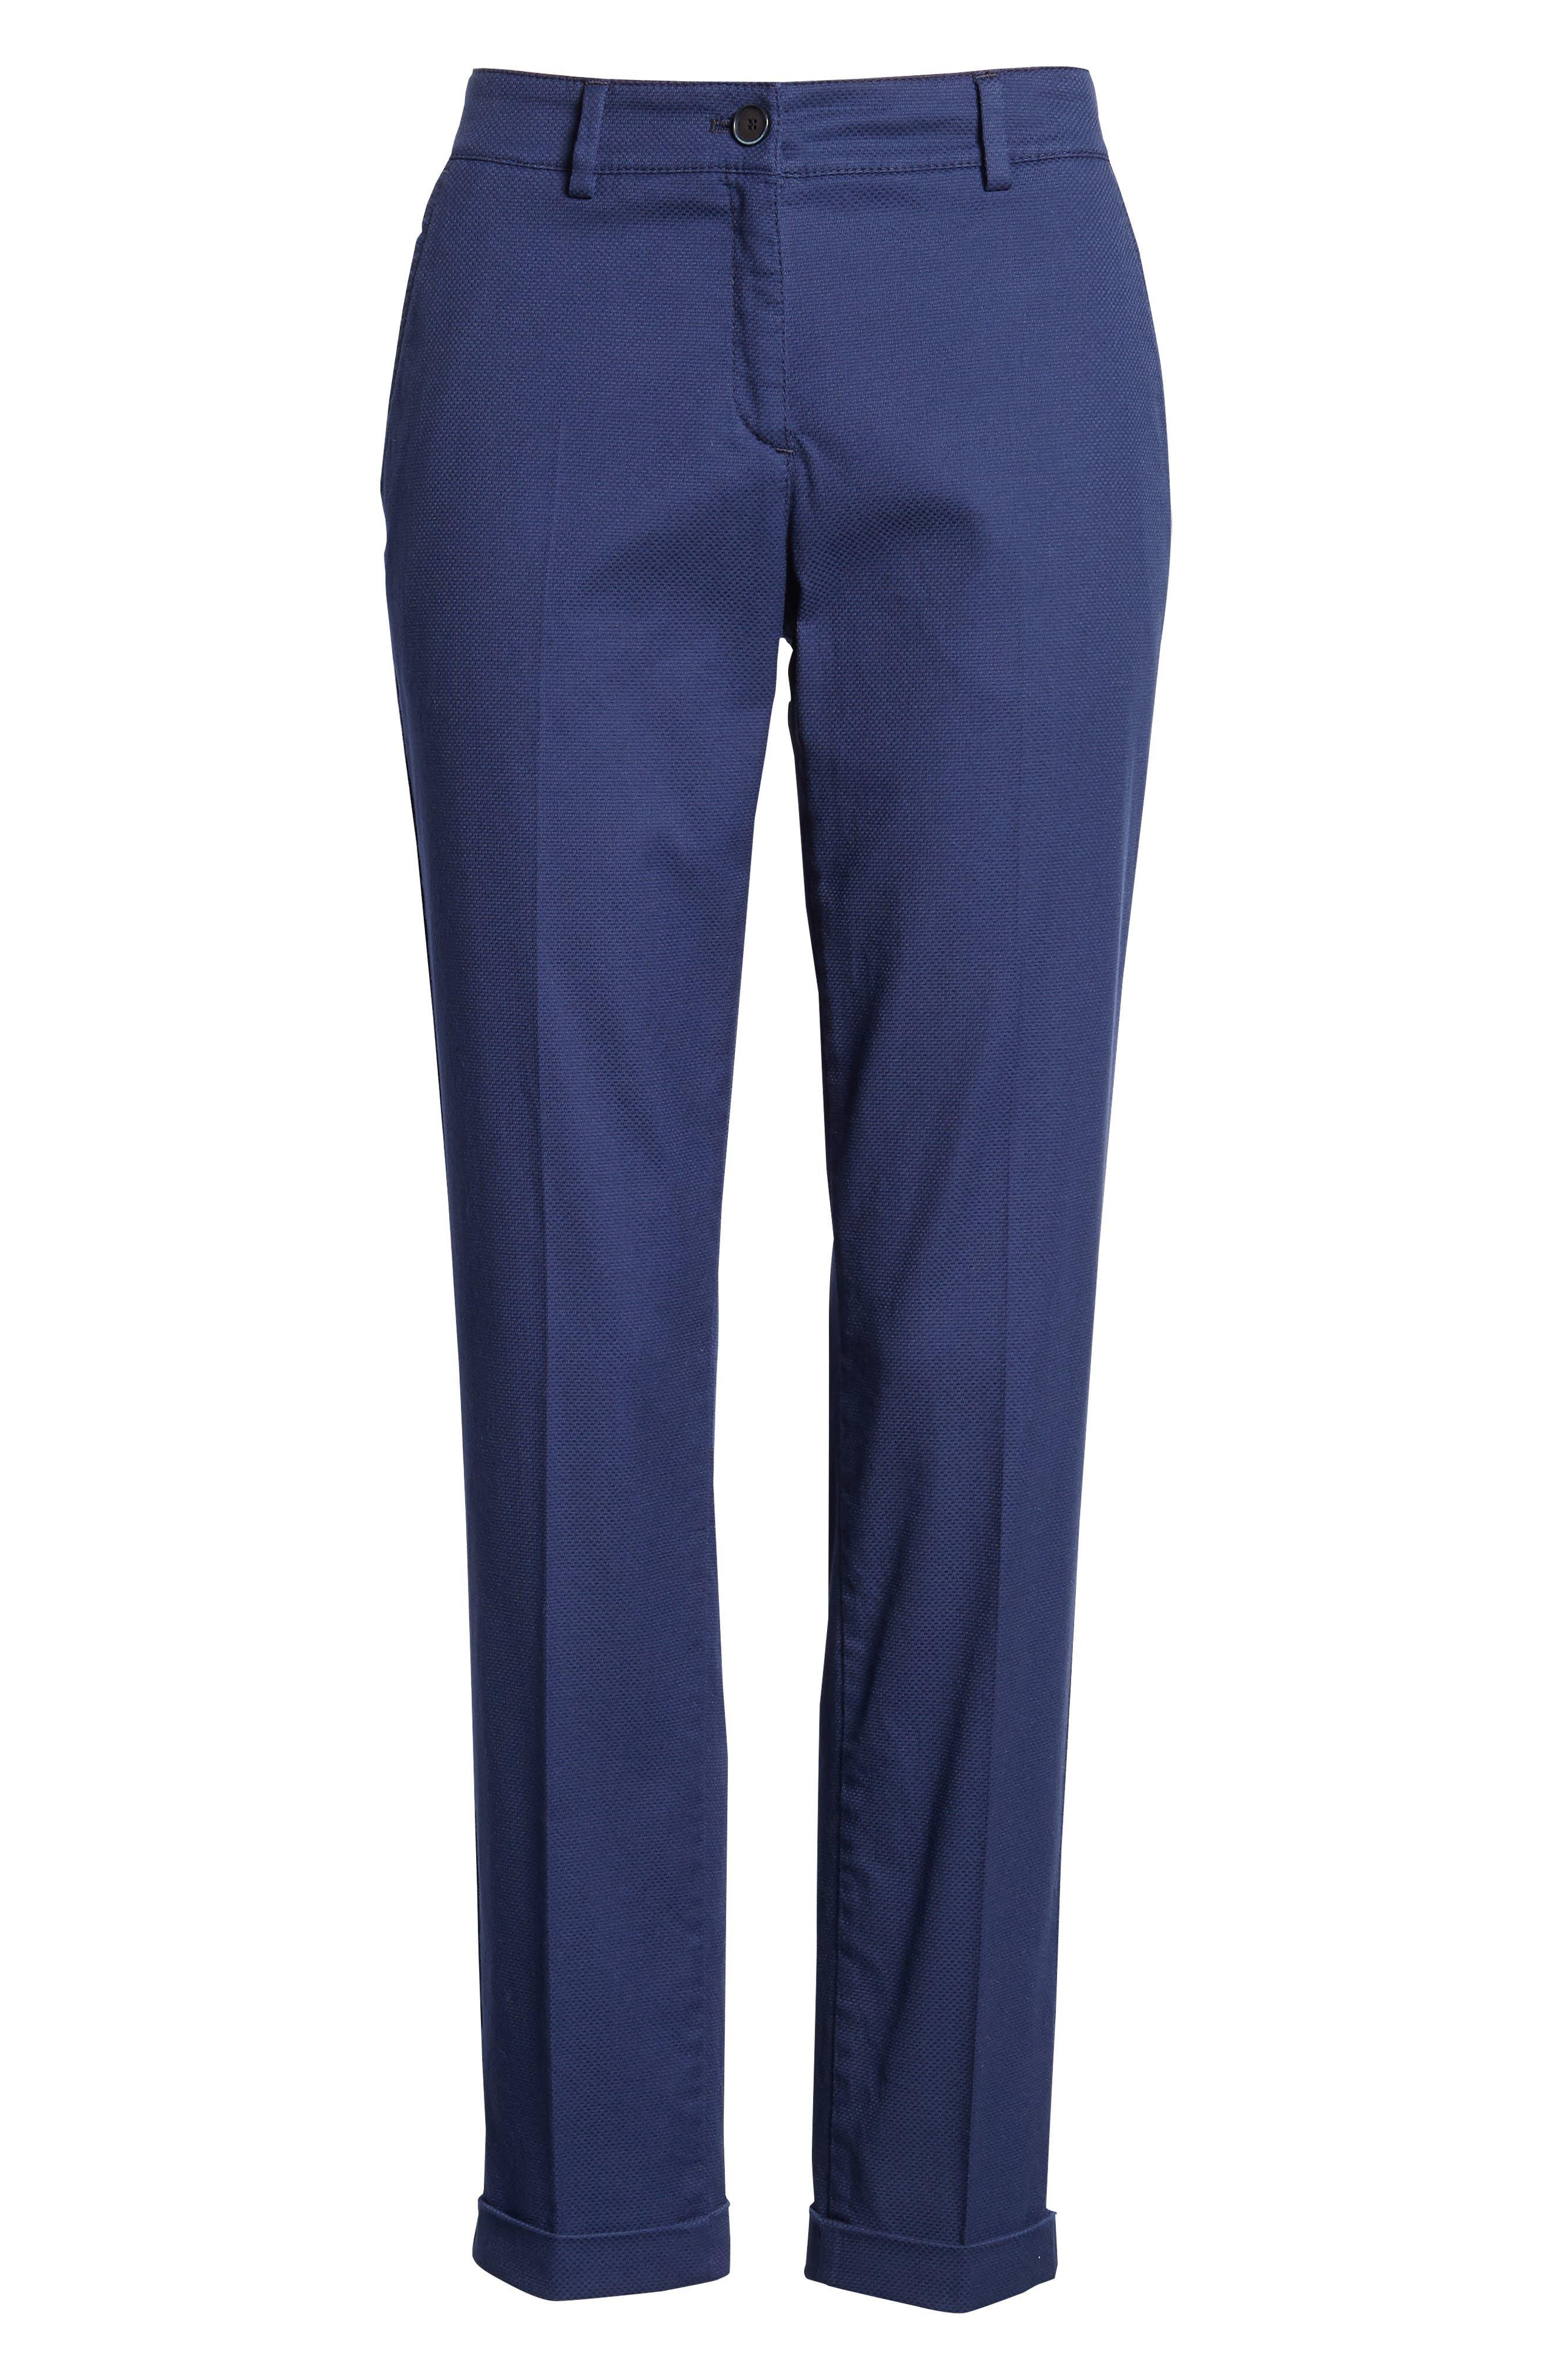 Maron Cuffed Straight Leg Pants,                             Alternate thumbnail 7, color,                             Navy